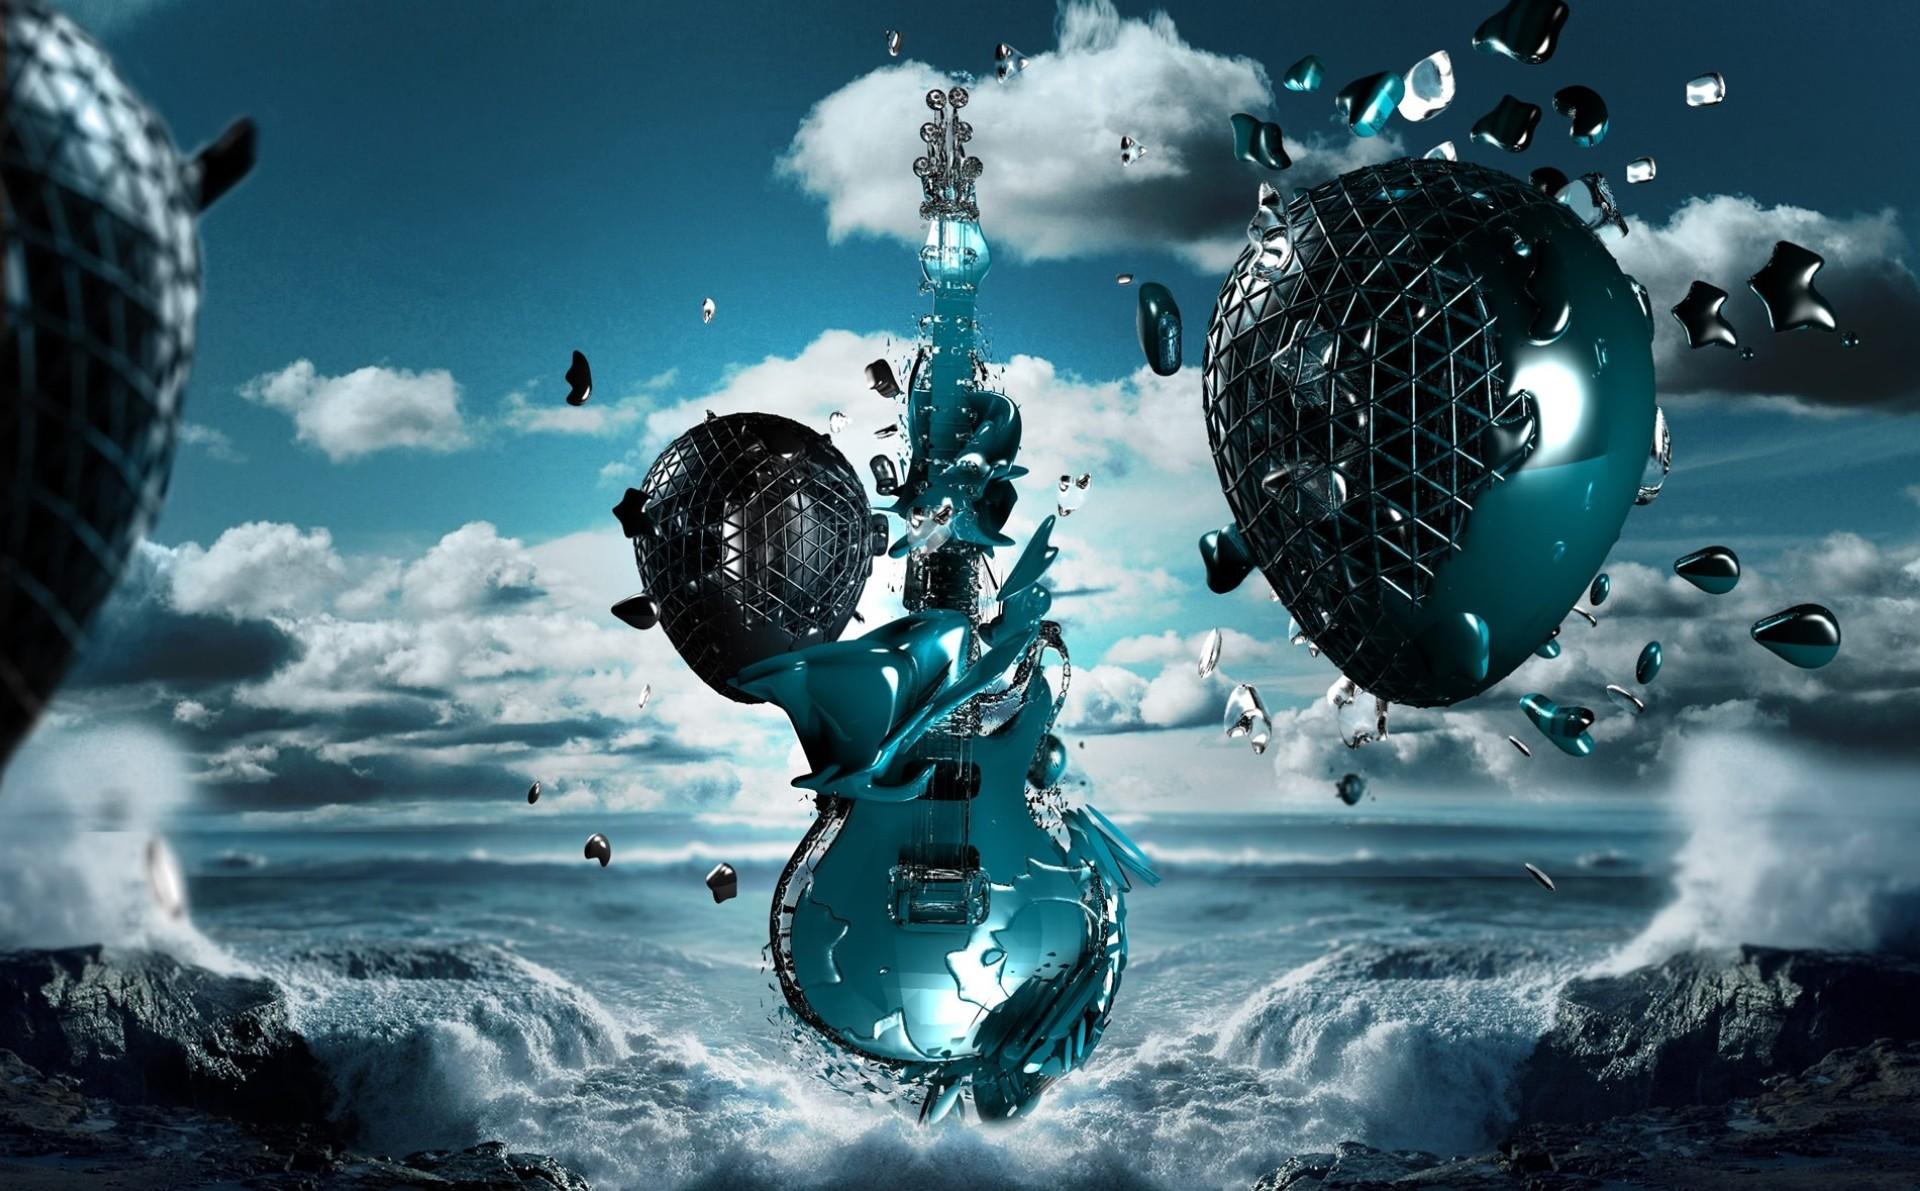 3D Music | 3d music wallpaper 3d music wallpaper